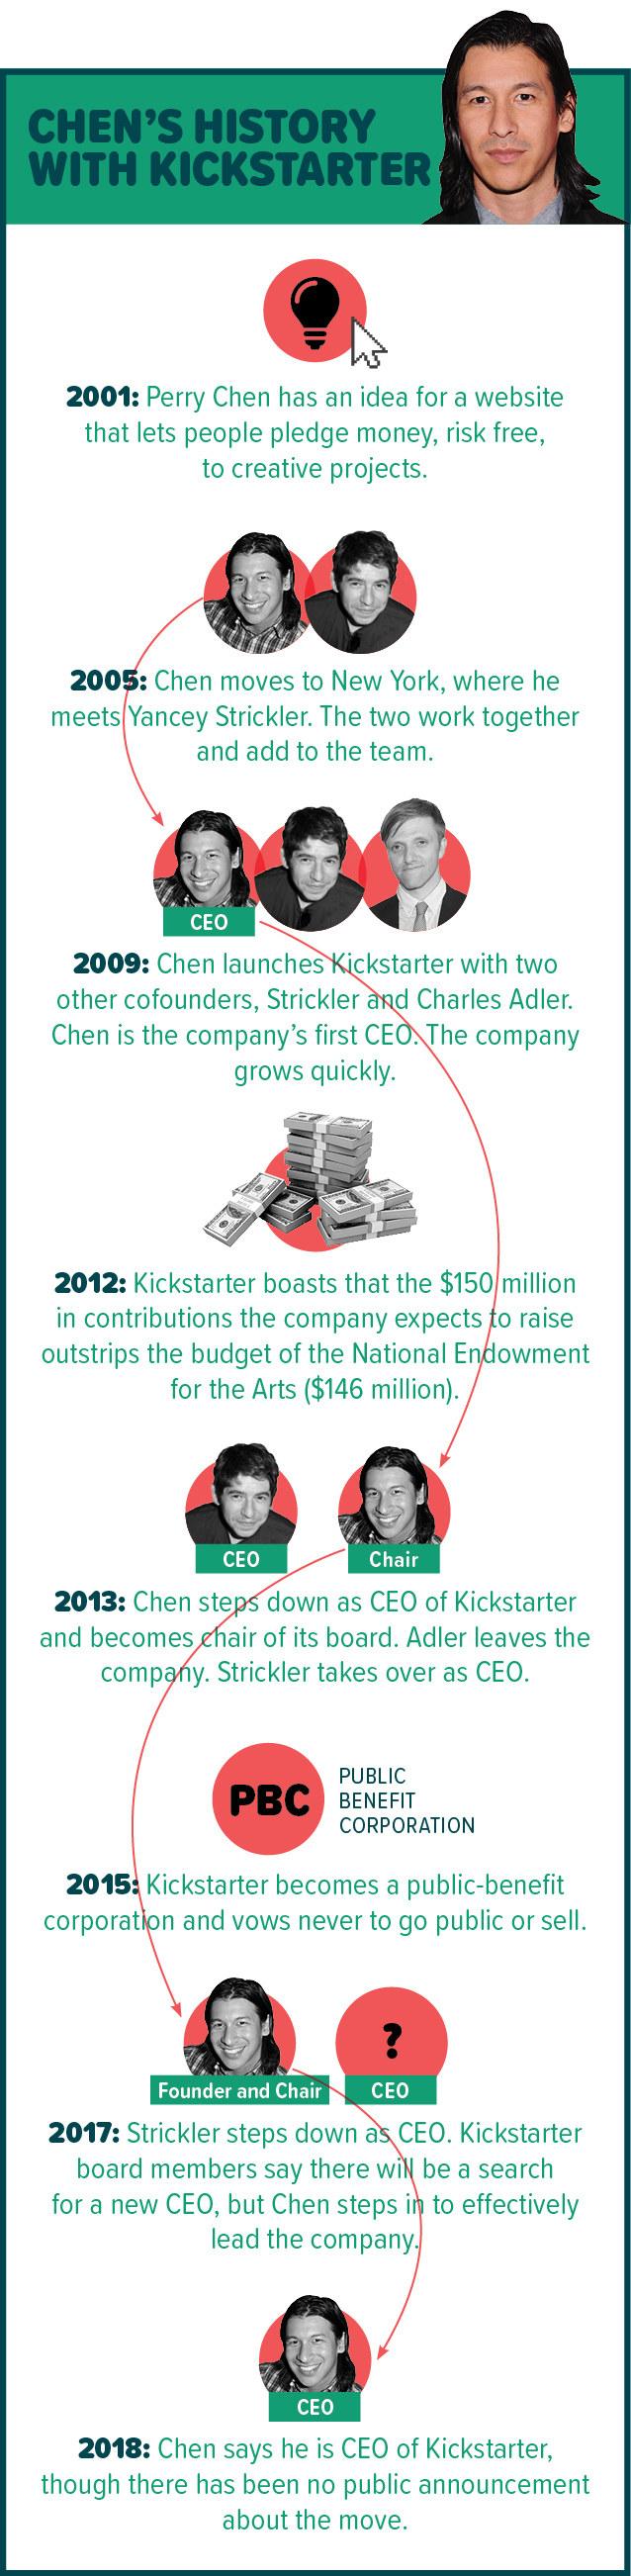 Chen's History With Kickstarter